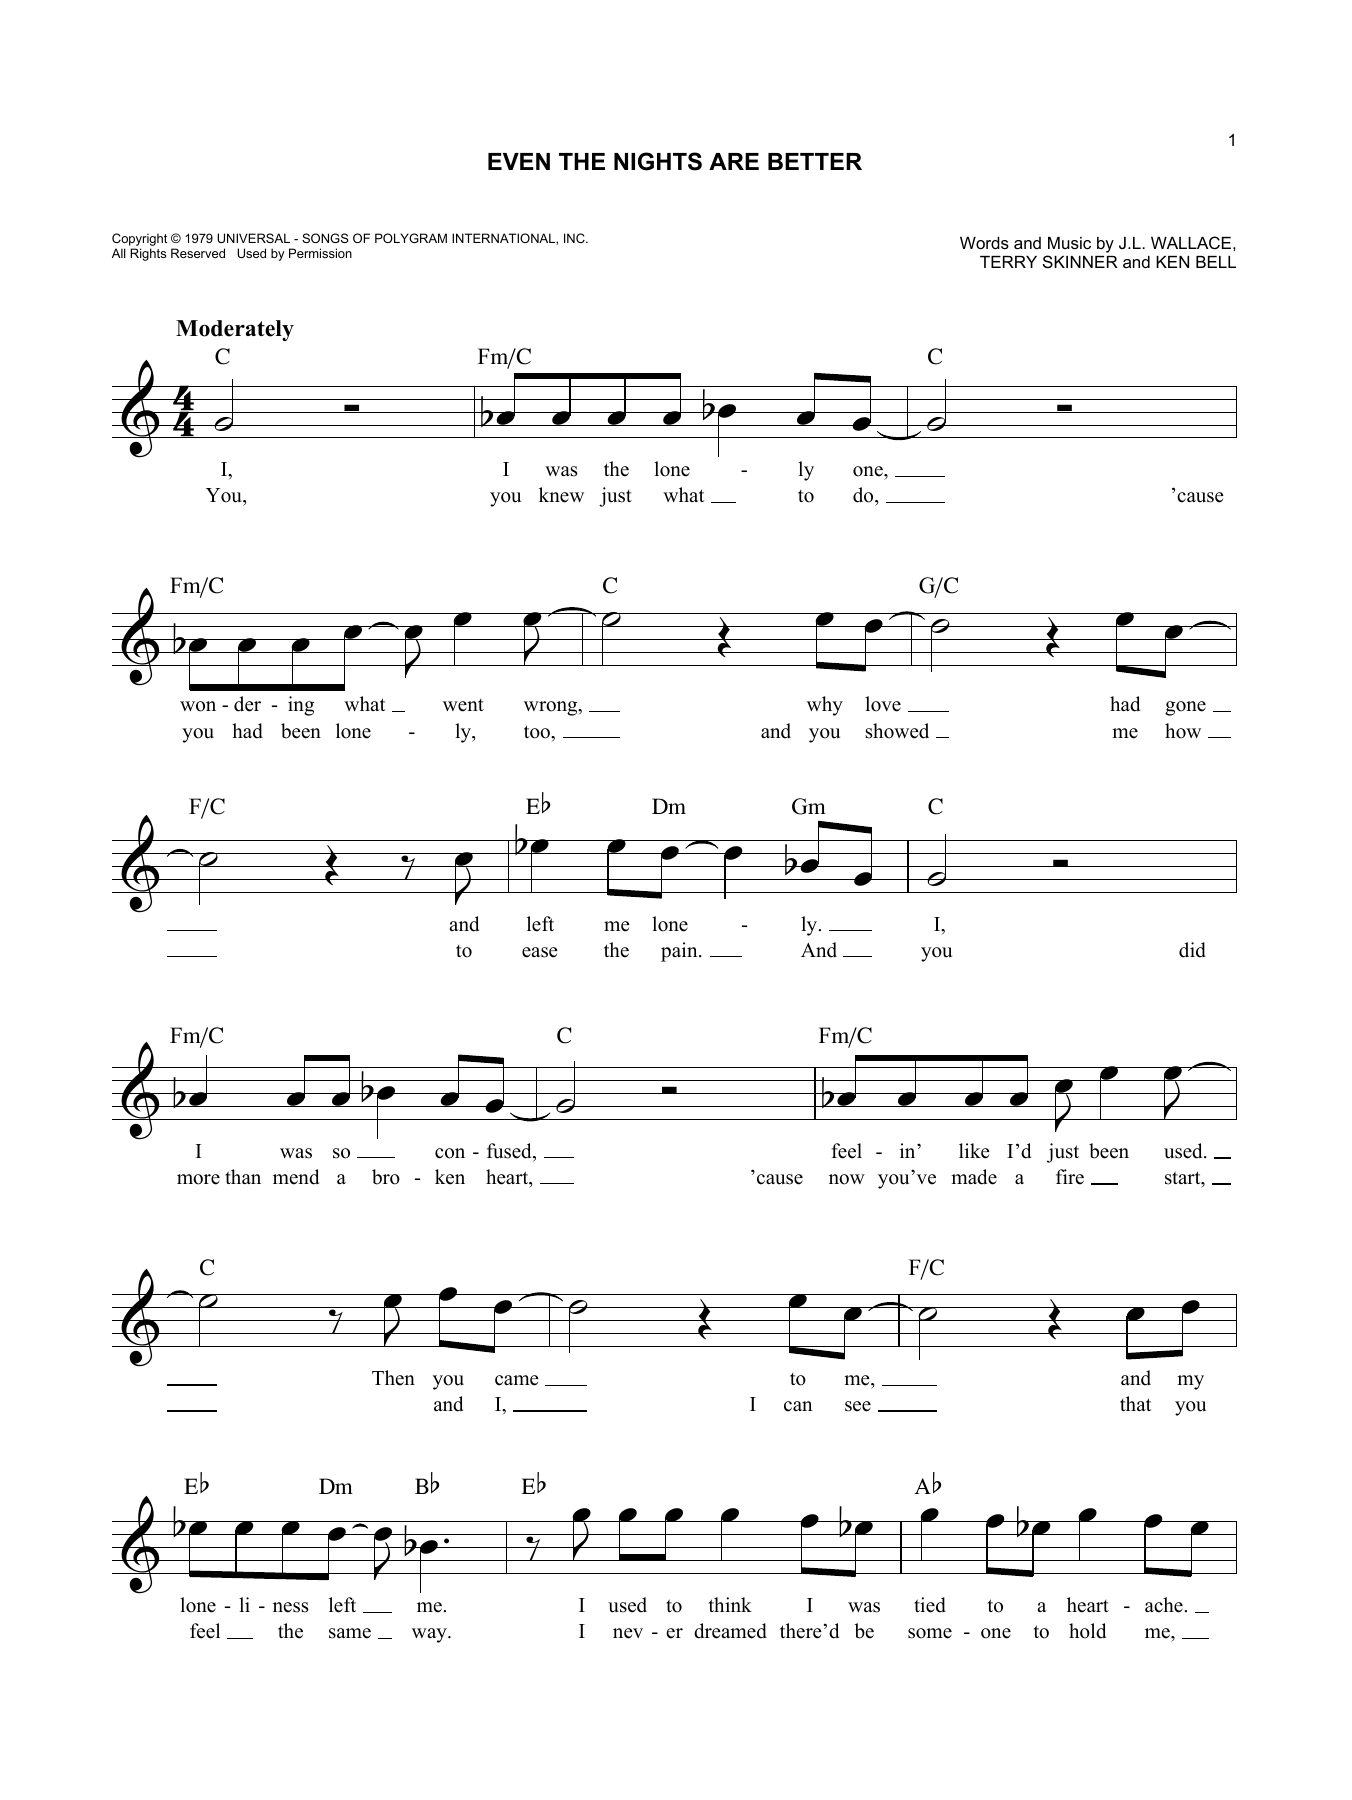 Sheet Music Digital Files To Print Licensed Air Supply Digital